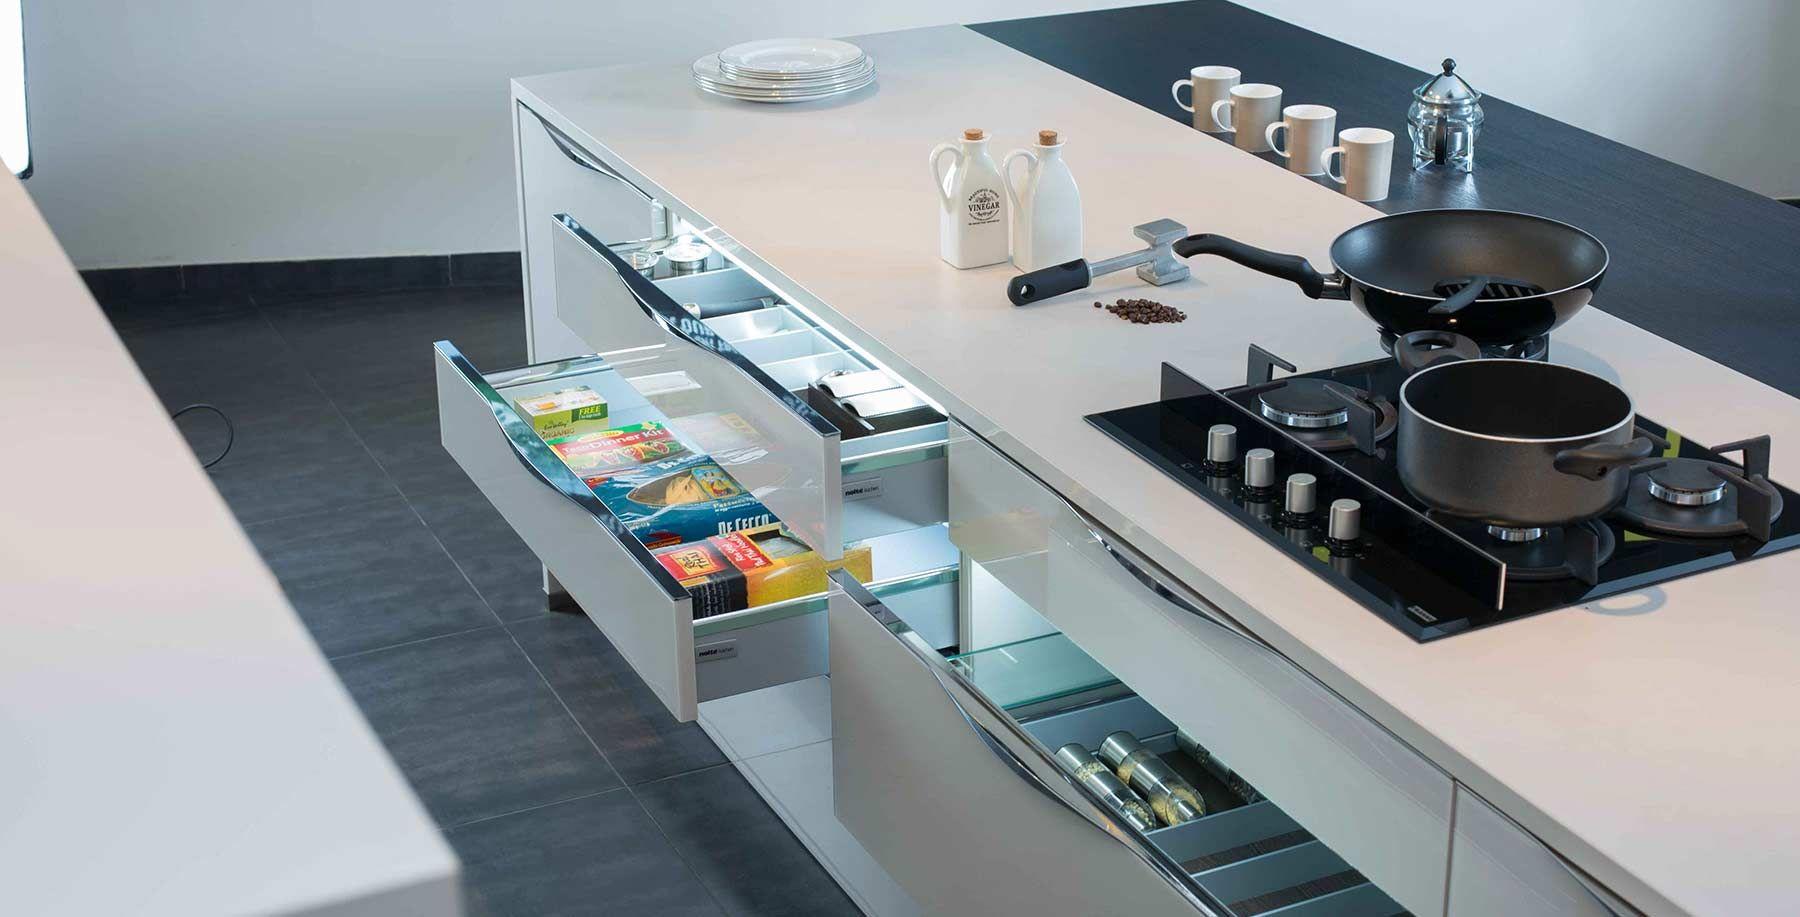 Bcpl best modular kitchen accessories shop kochi ernakulam kerala best kitchen